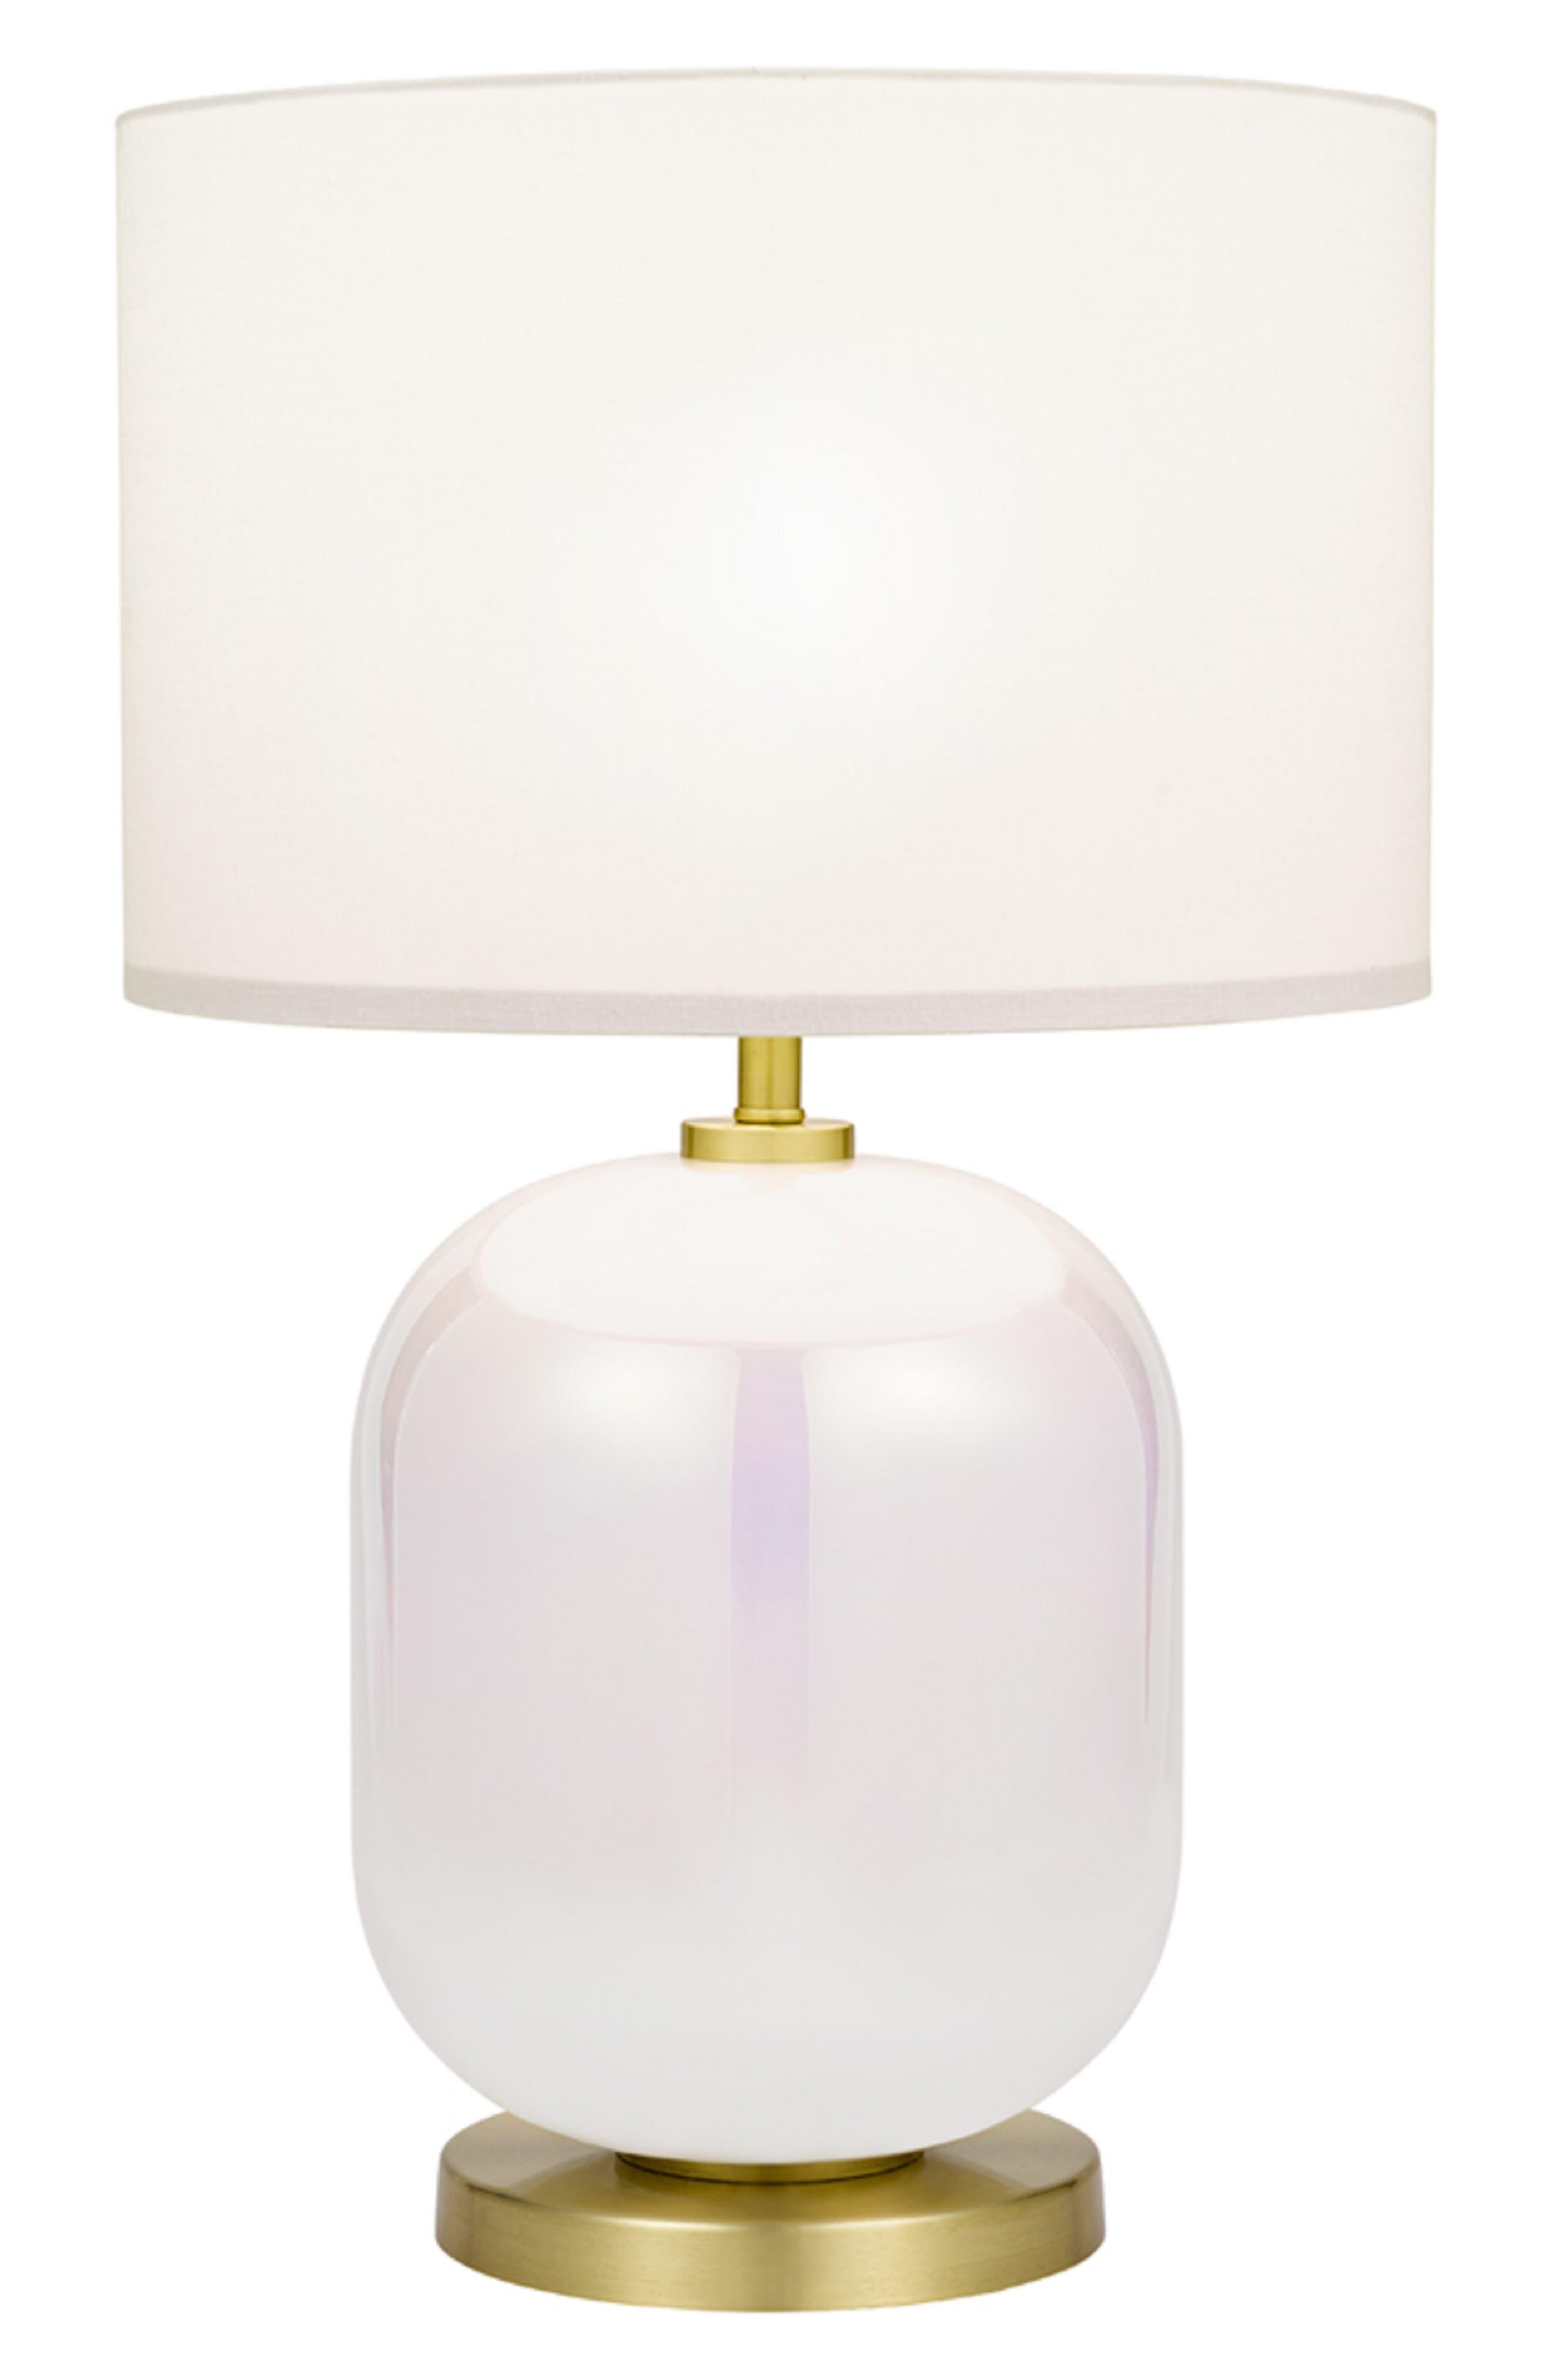 Iridescent Table Lamp,                             Main thumbnail 1, color,                             Iridescent